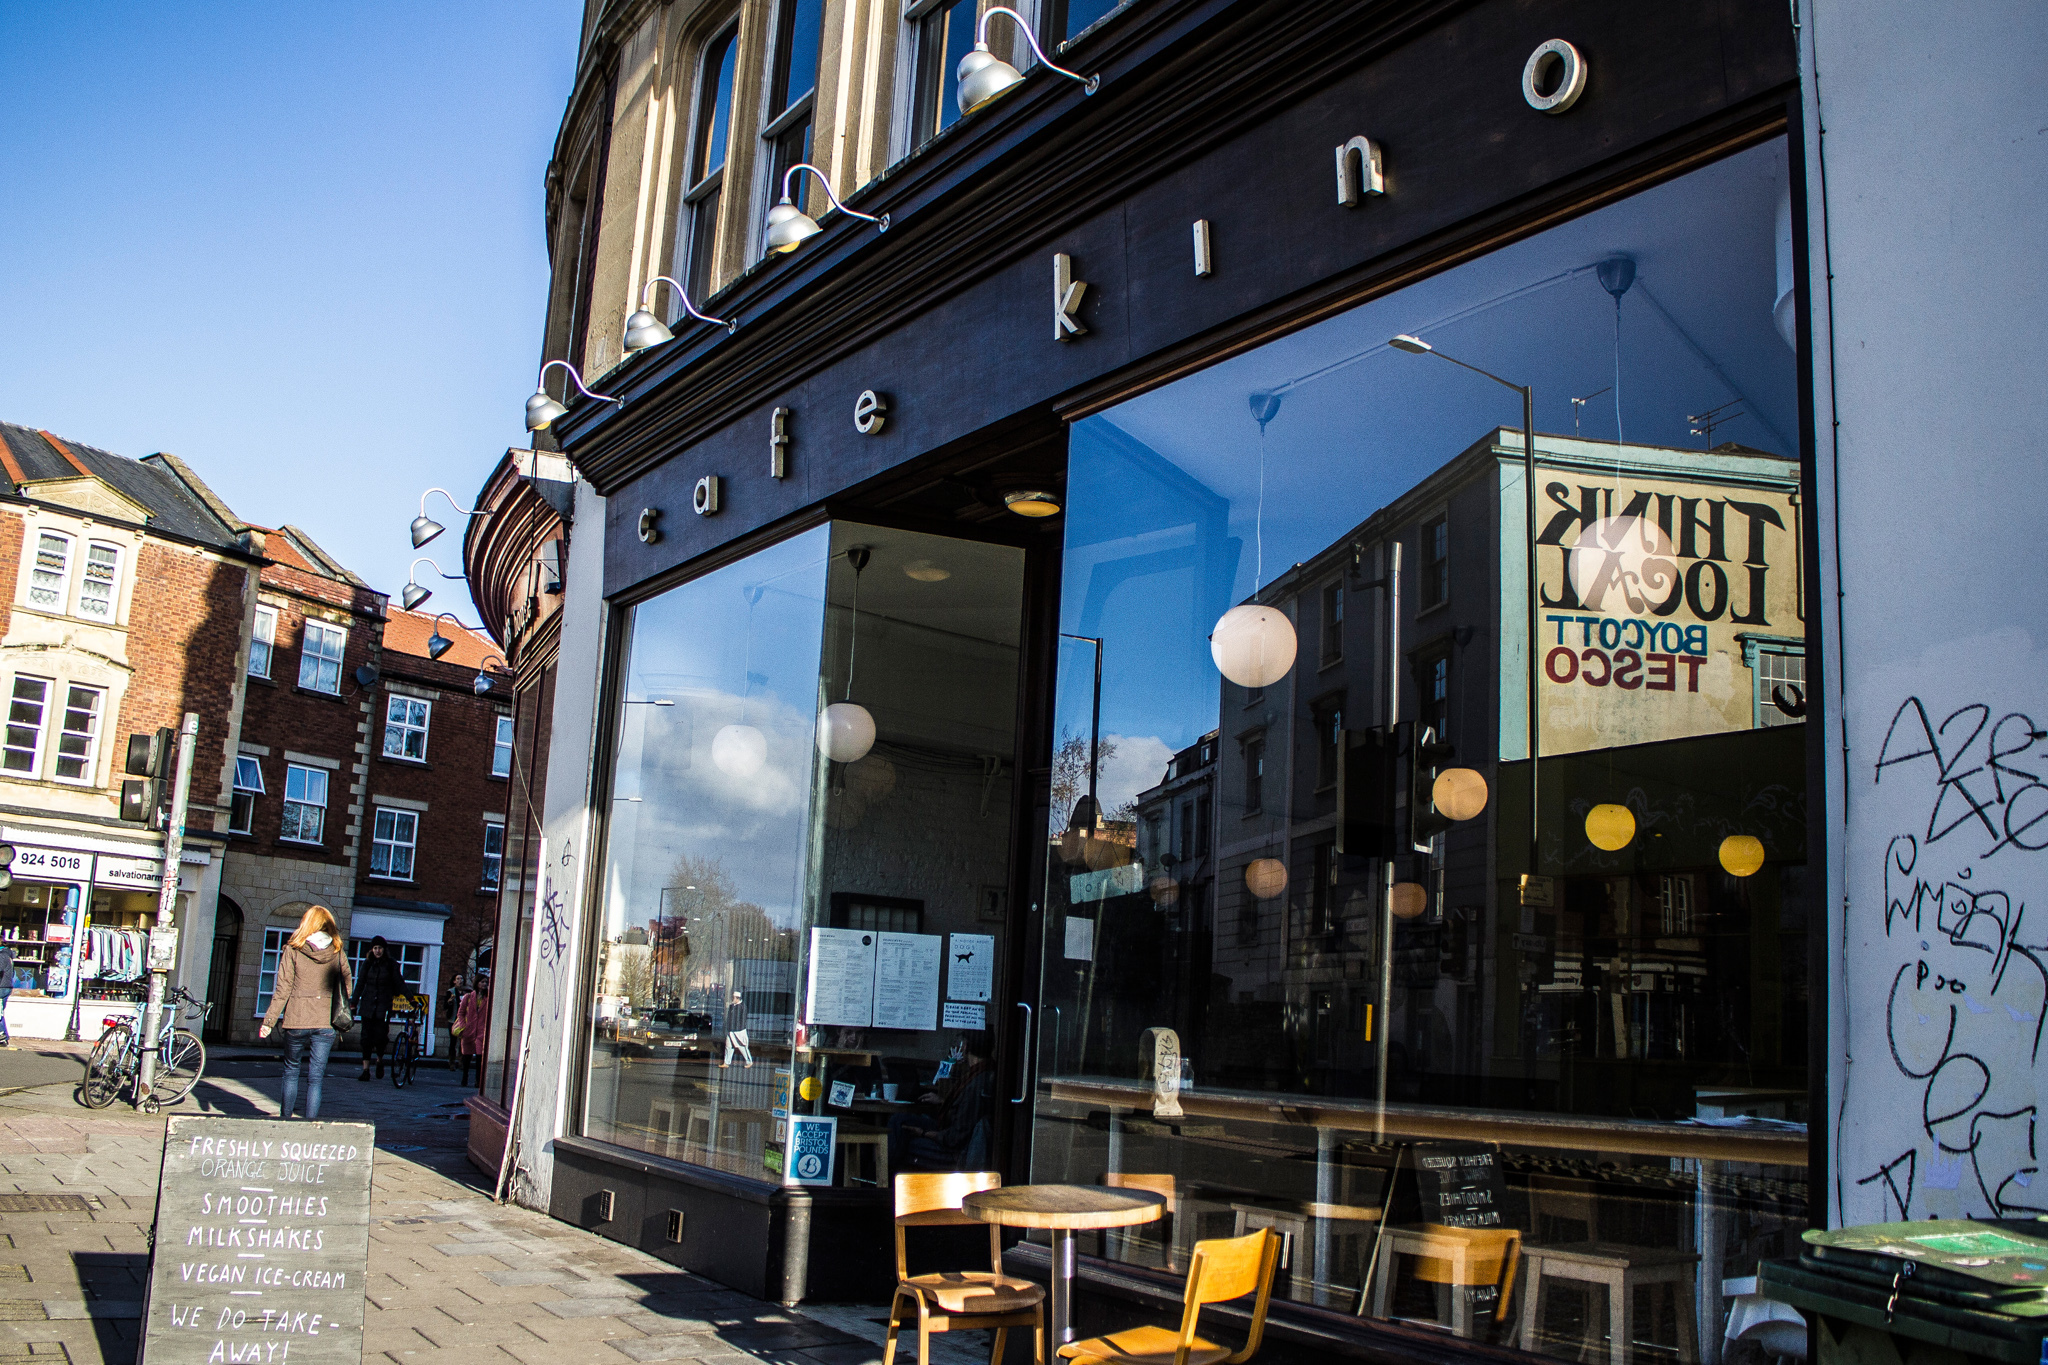 Cafe Kino, Stokes Croft, Bristol